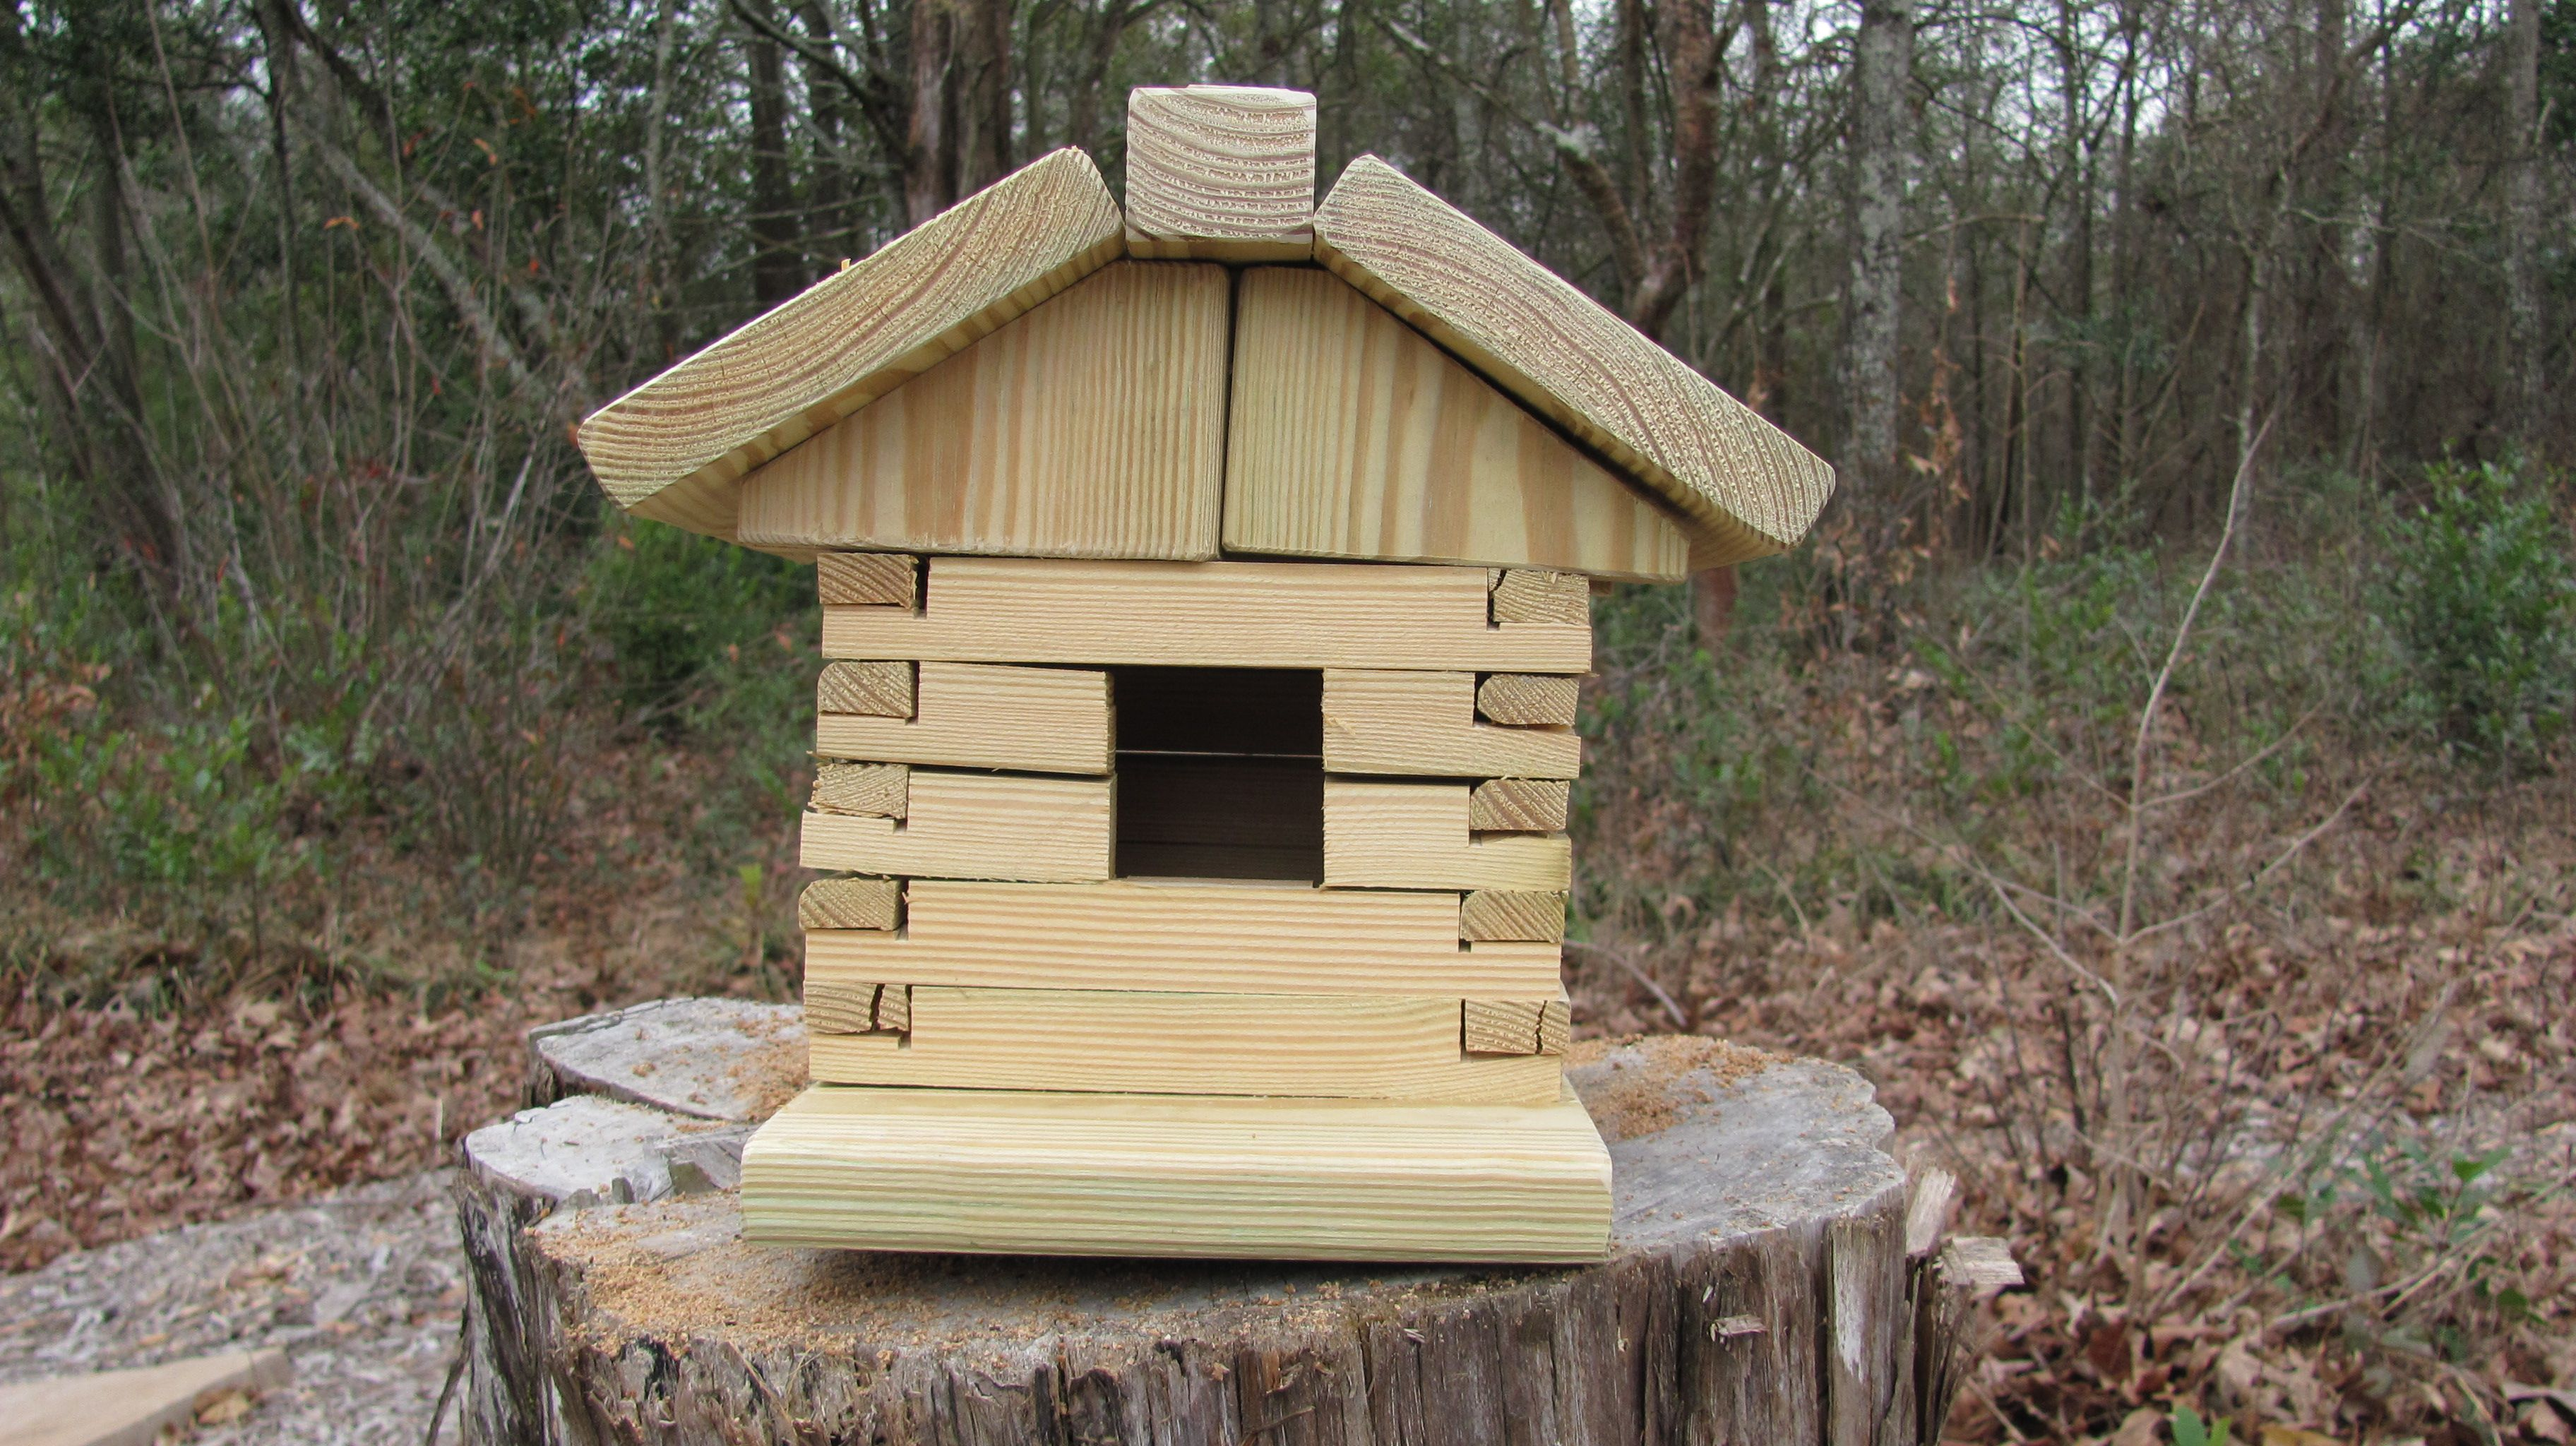 Log Cabin Bird House Made From Heavy Duty Construction